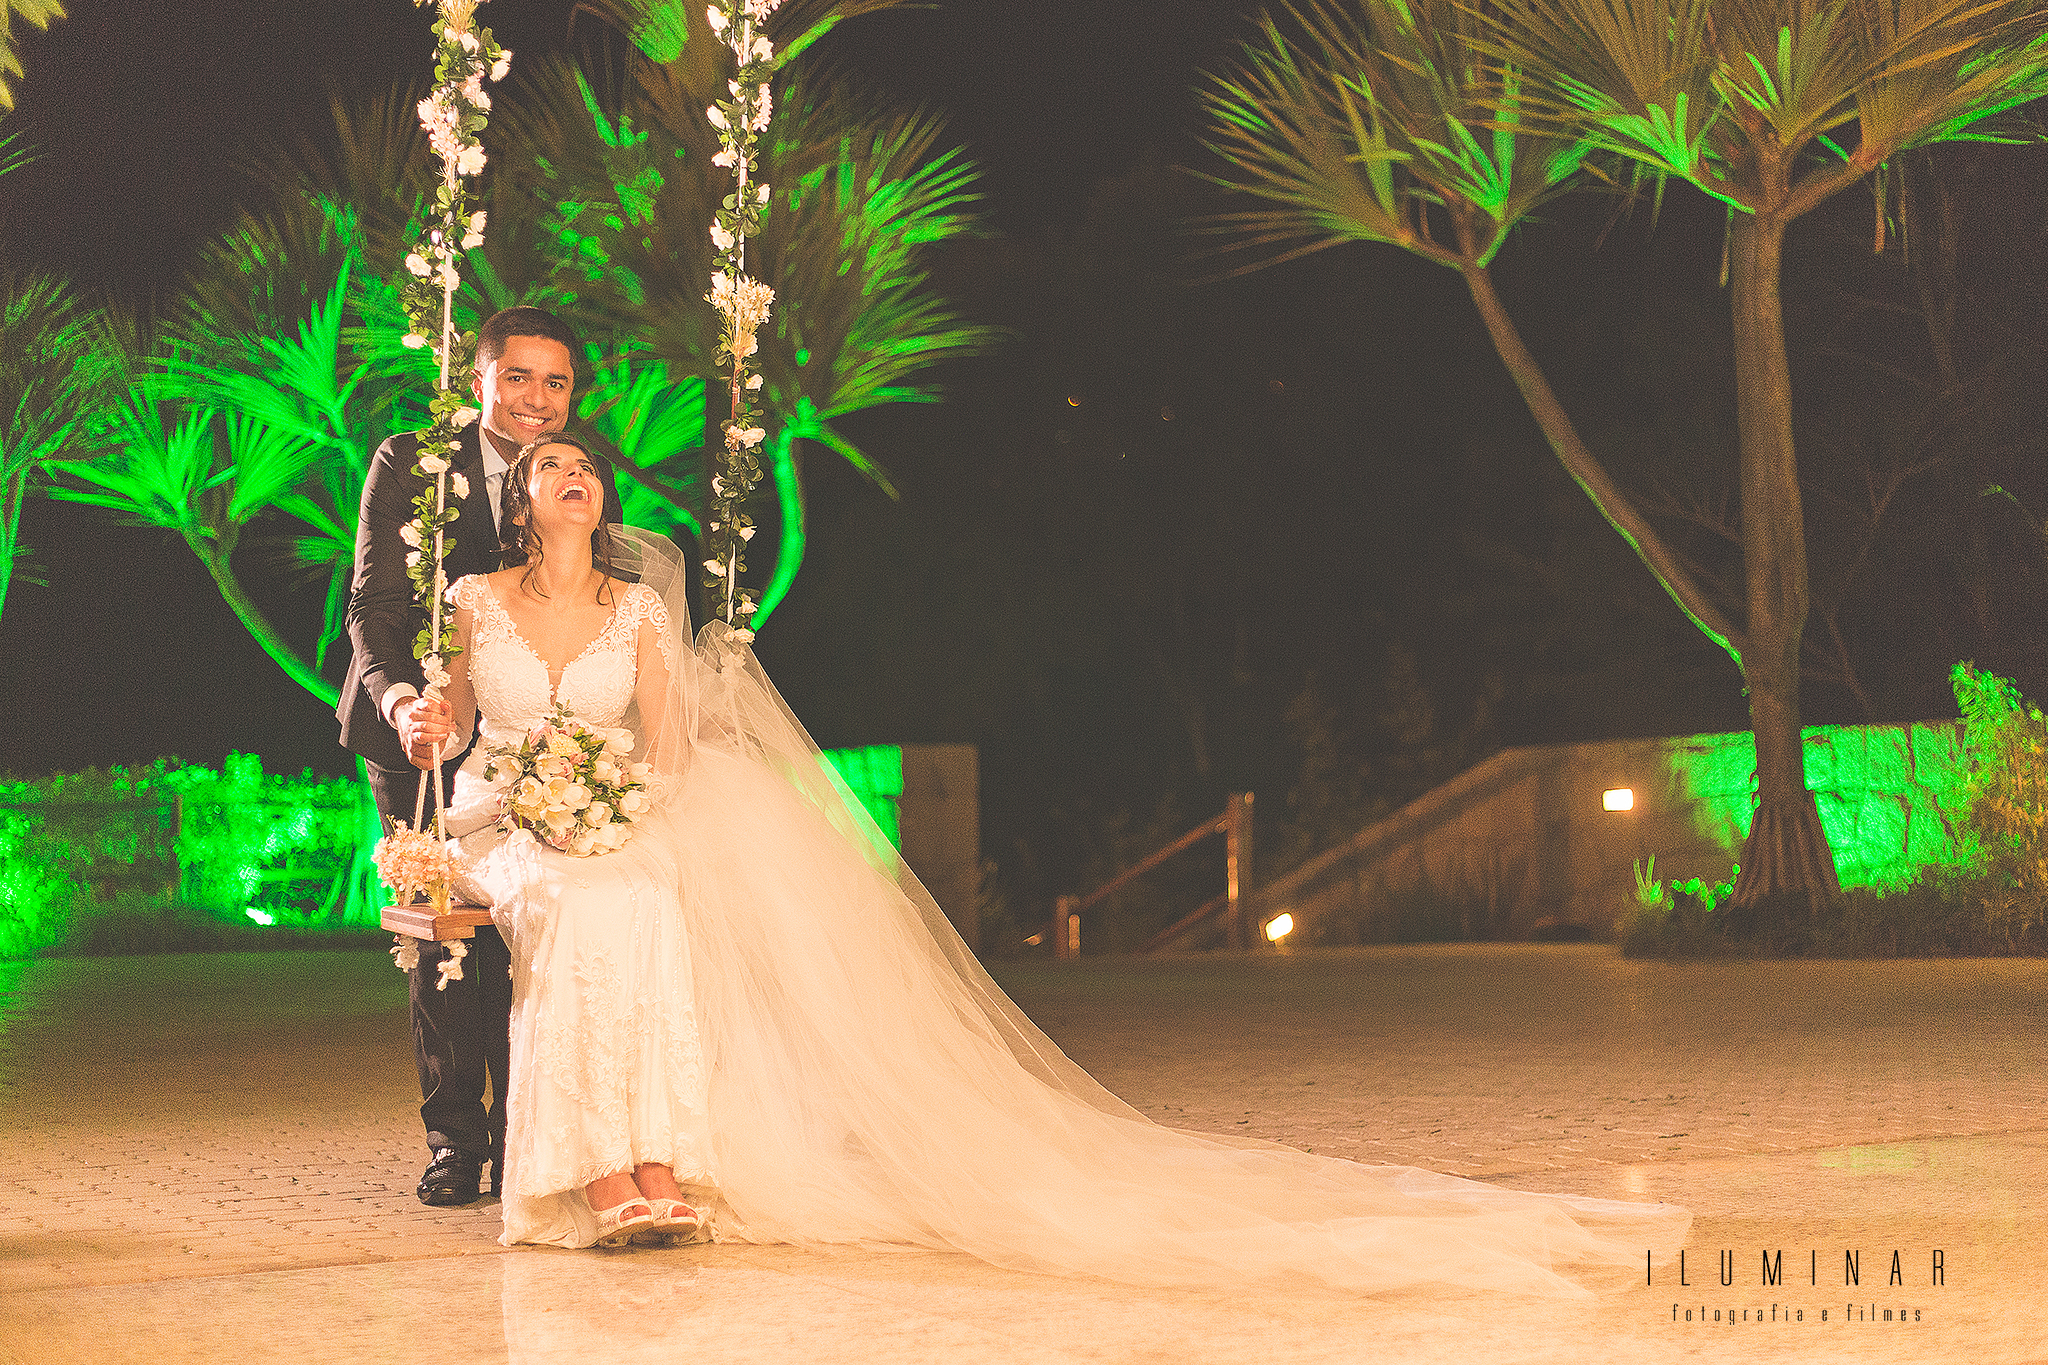 Fotografo Casamento Chácara Paraiso